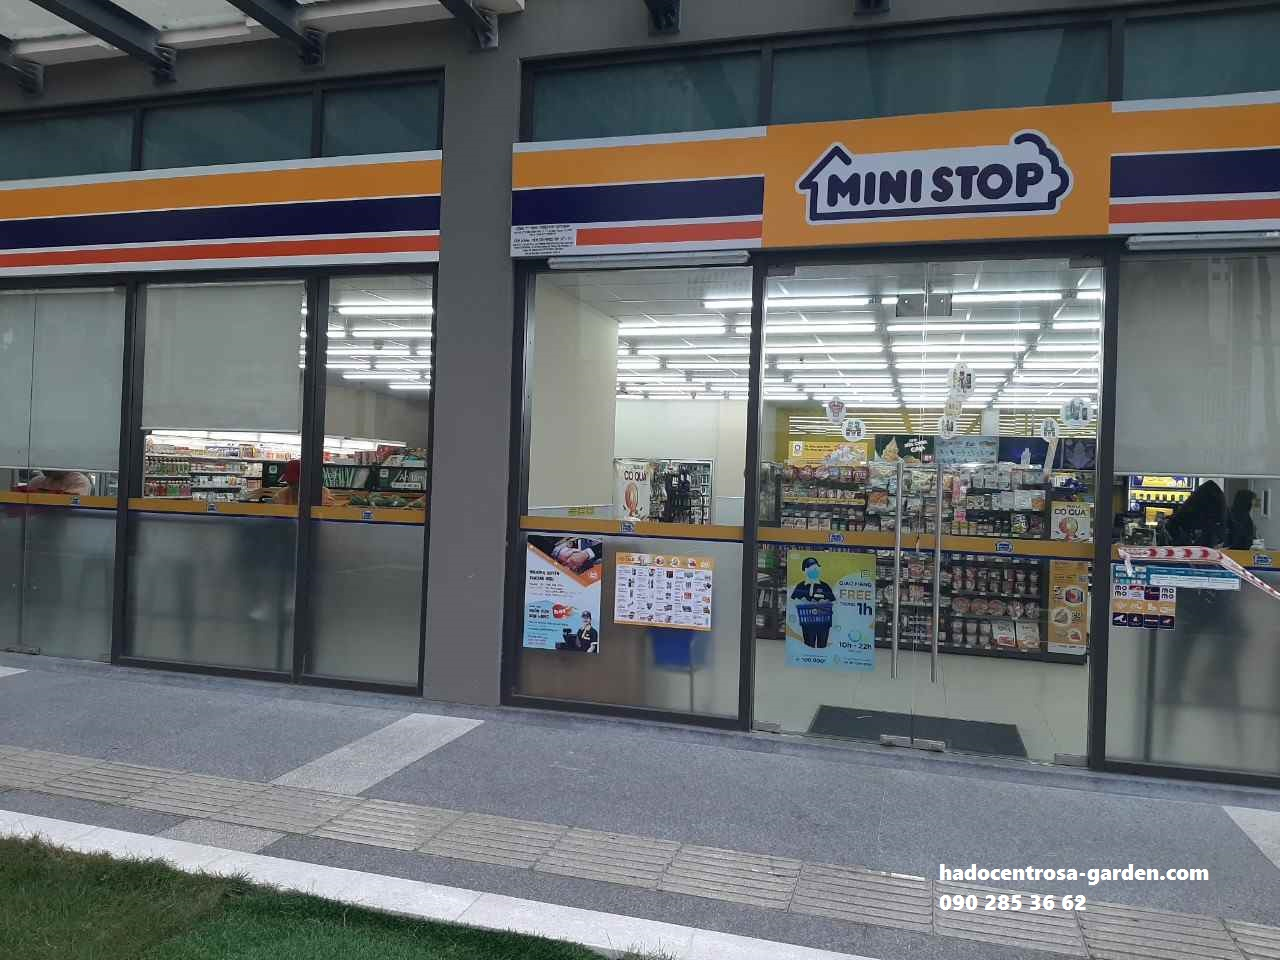 siêu thị tiện lợi hado centrosa